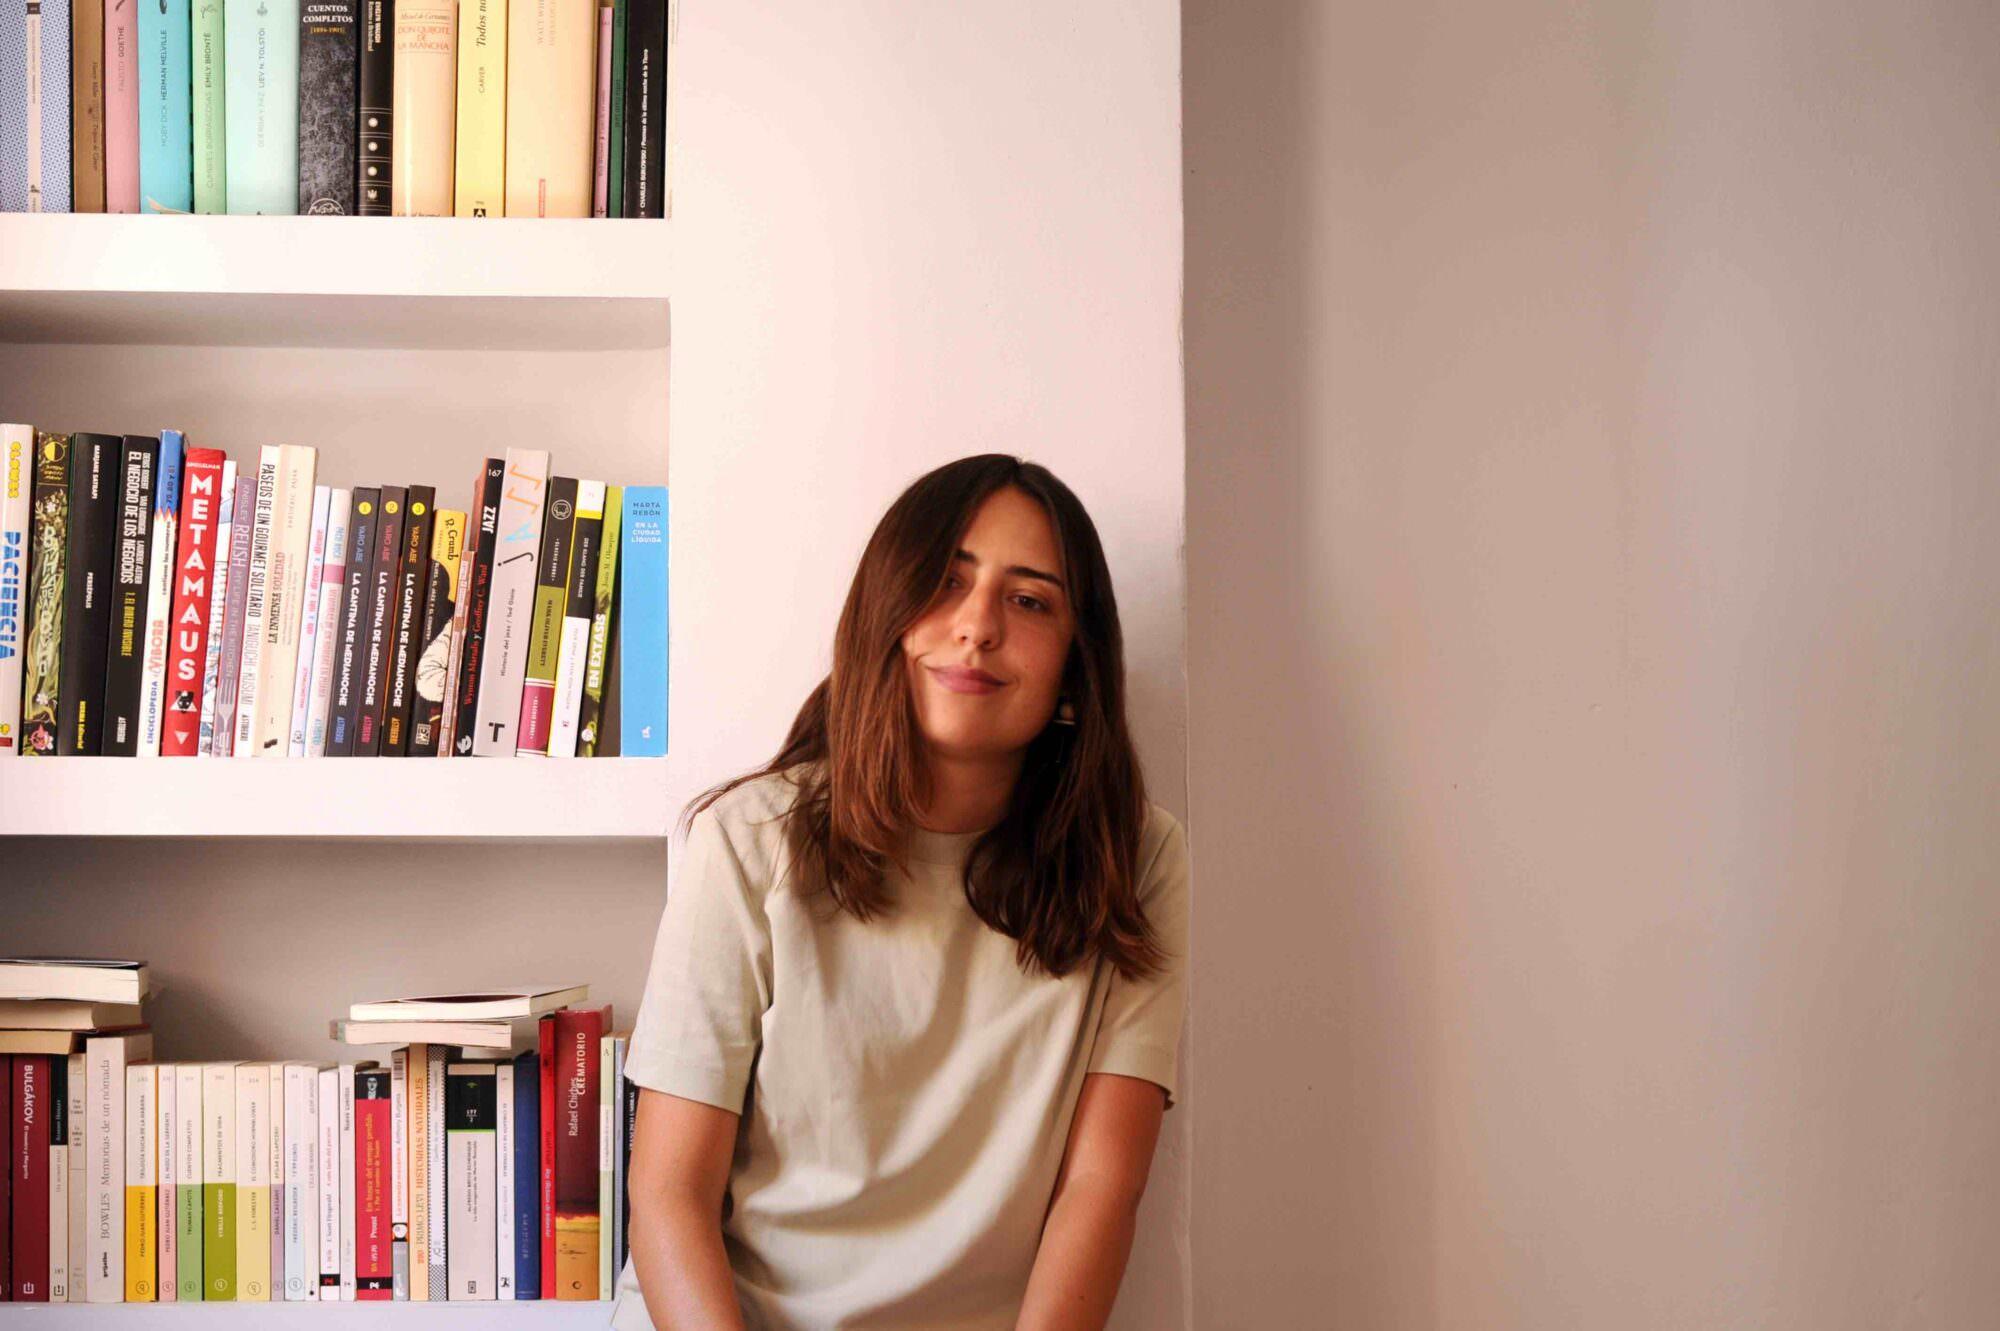 Lidia Caro Leal